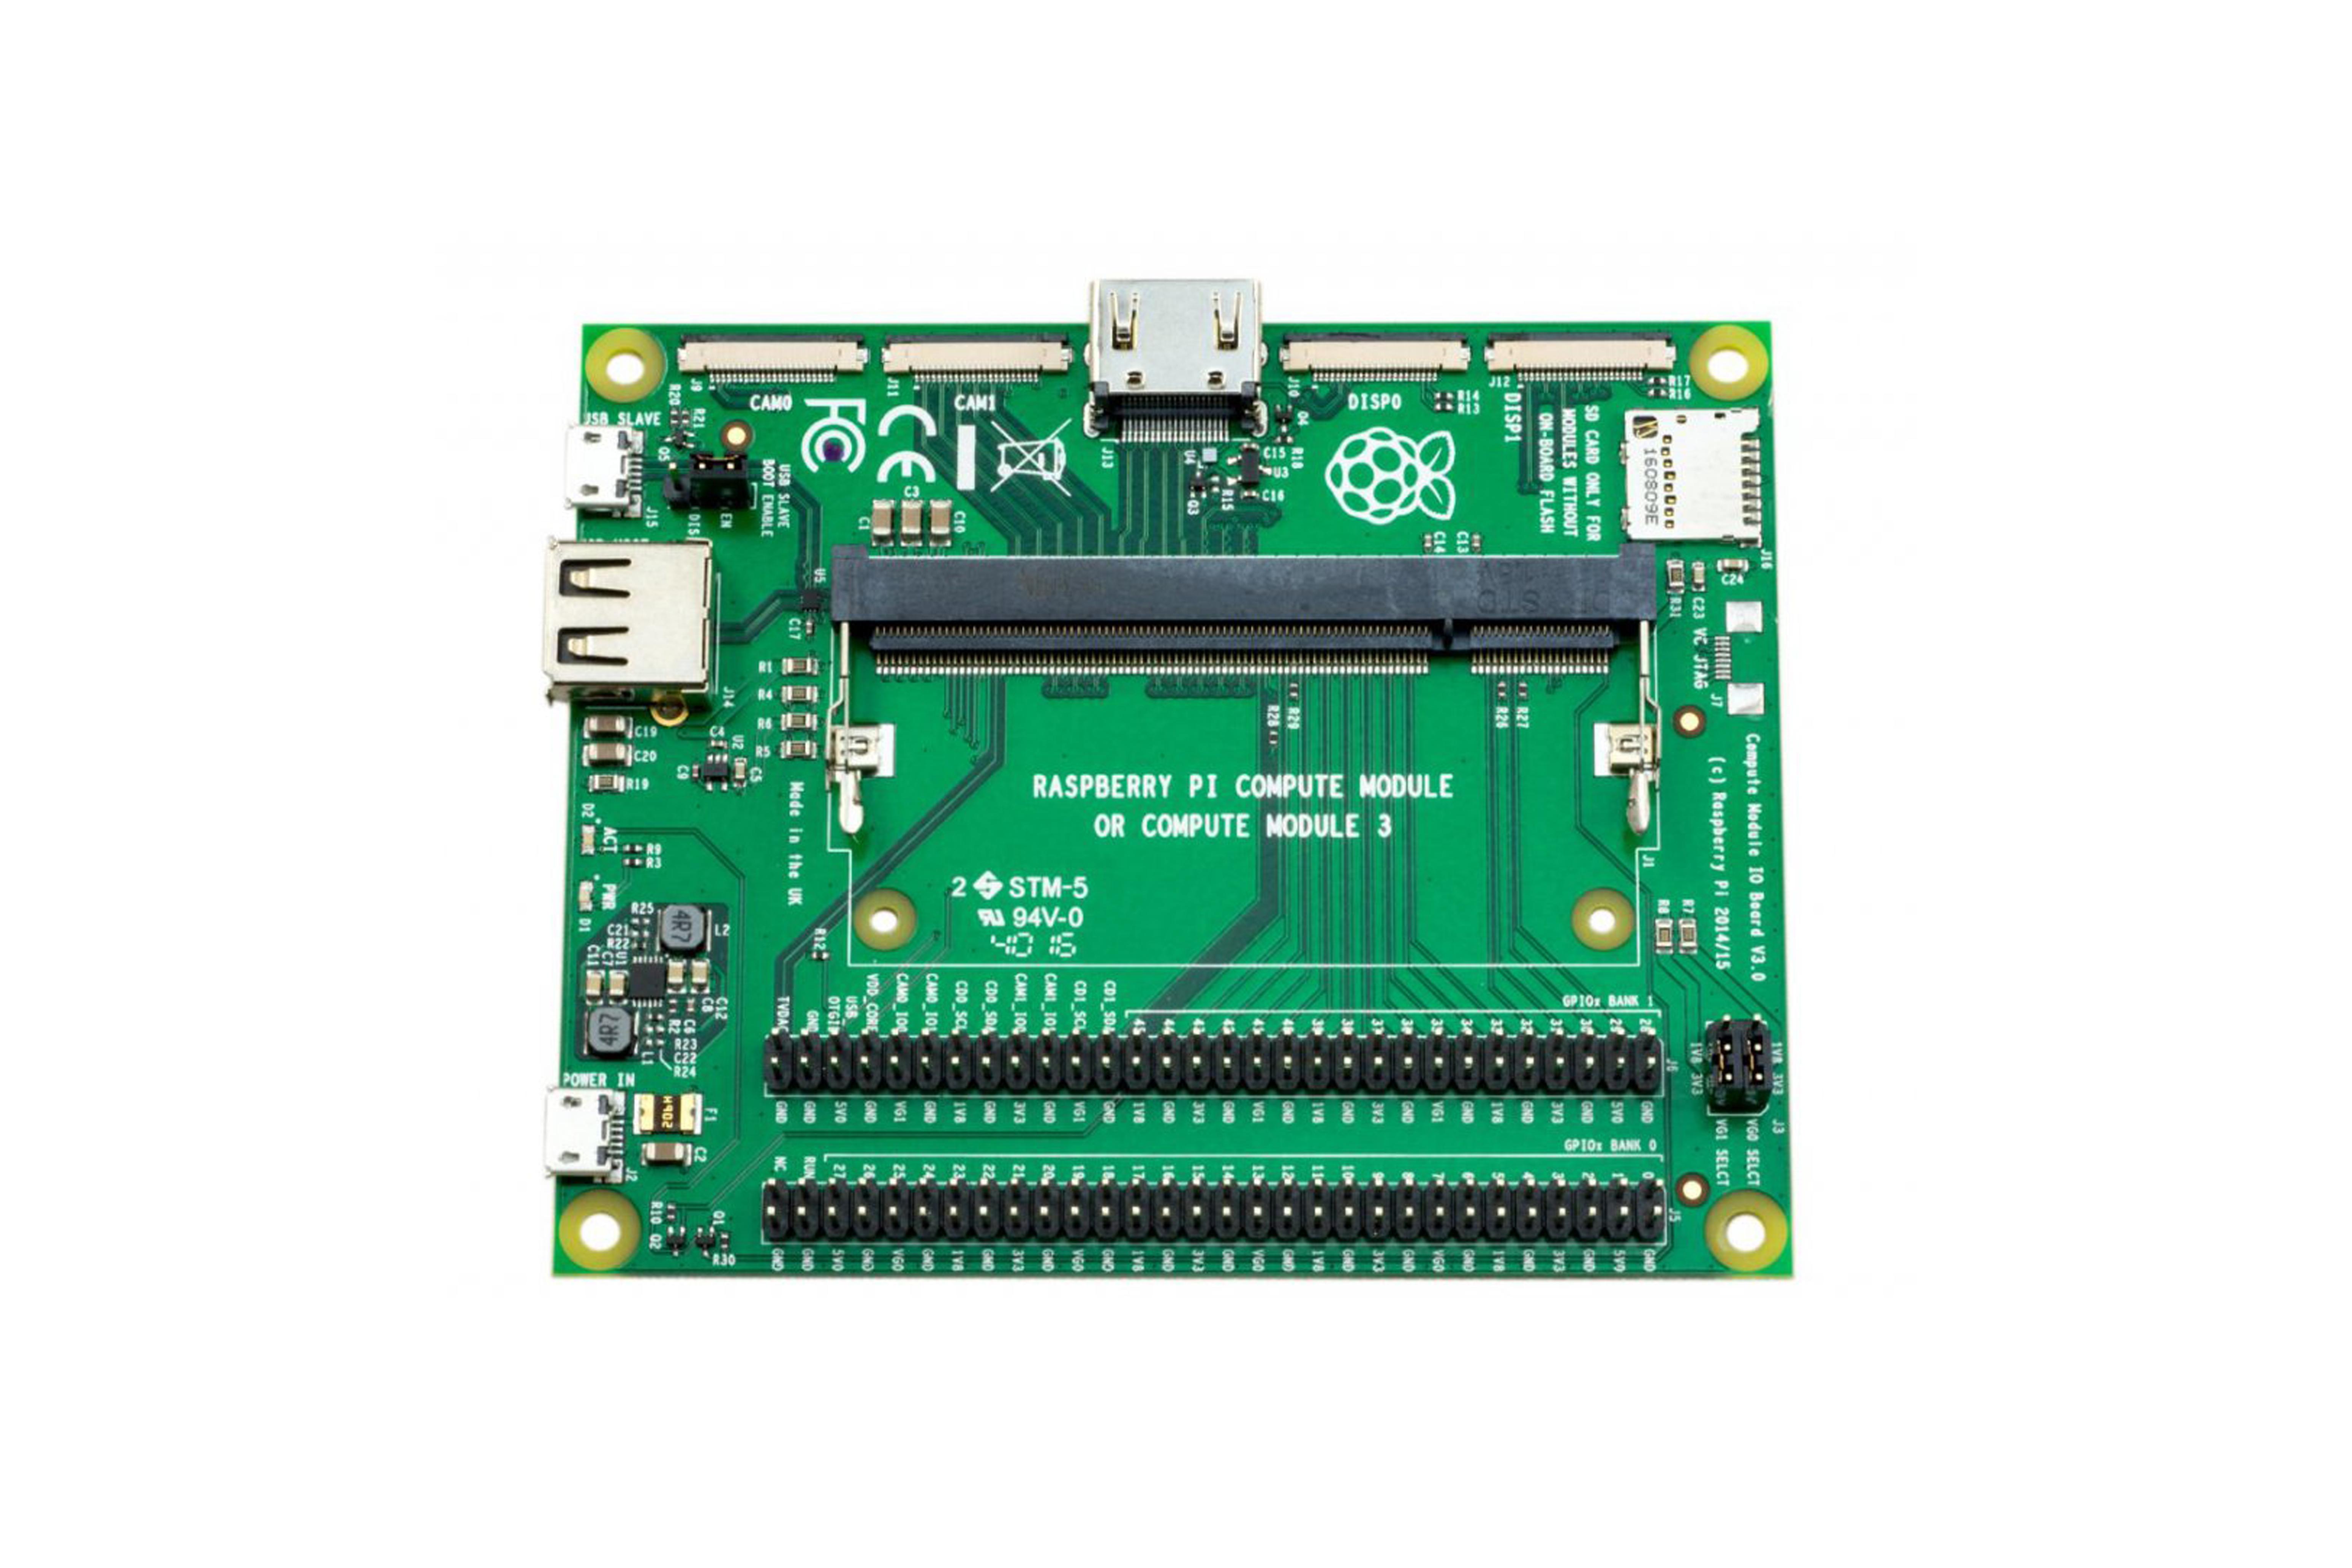 E/S Module de calcul 3 pour Raspberry Pi